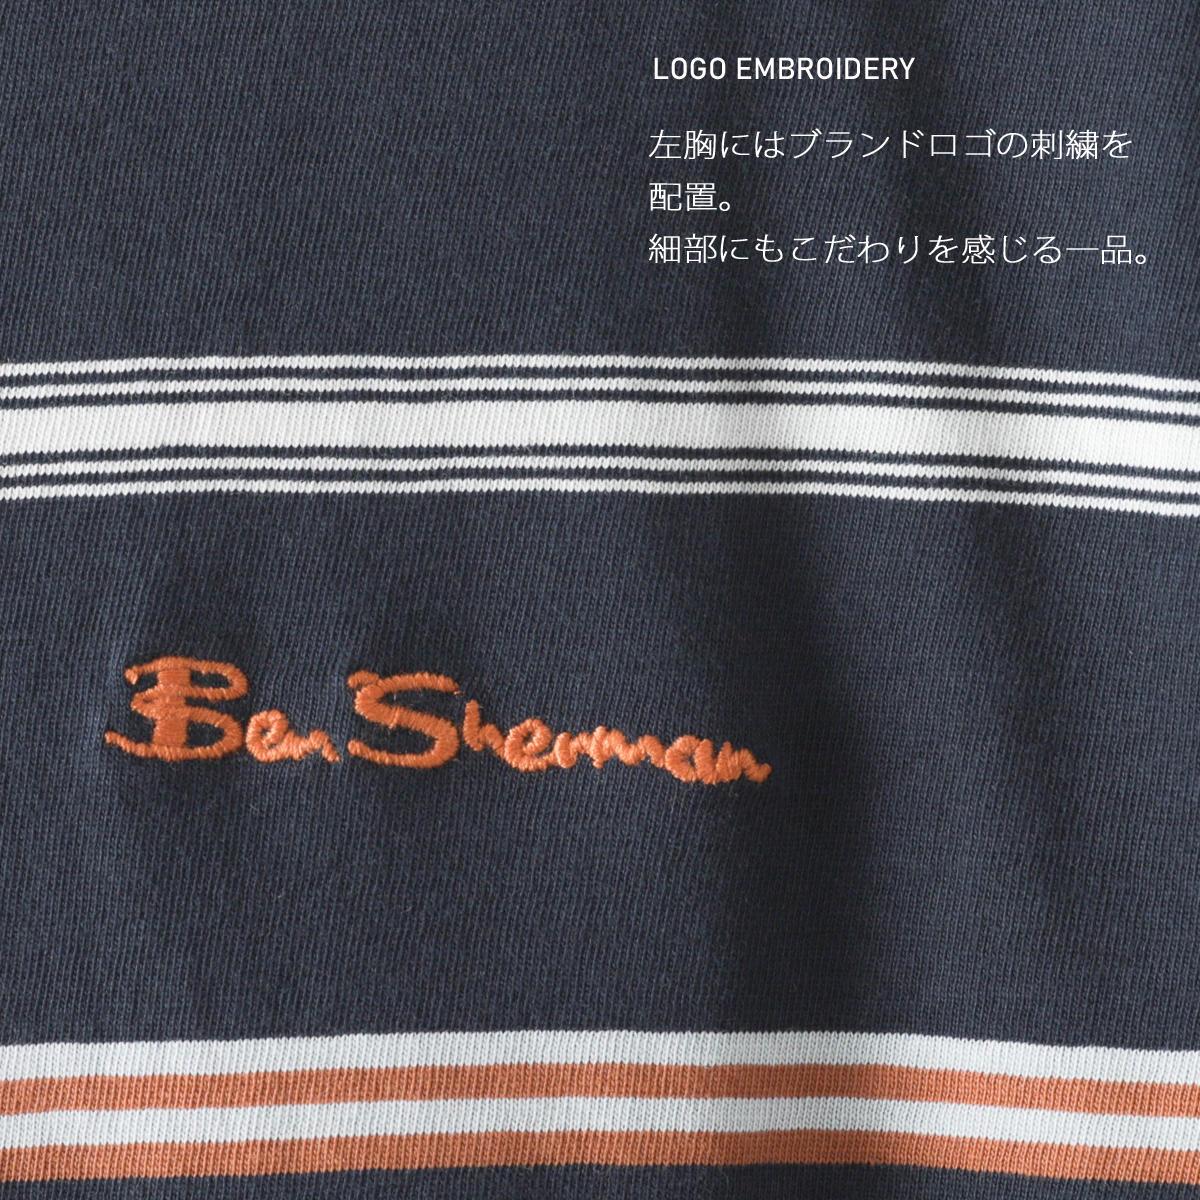 Ben Sherman ベンシャーマン メンズ Tシャツ ストライプ 3色 ネイビー イエロー ホワイト レギュラーフィット